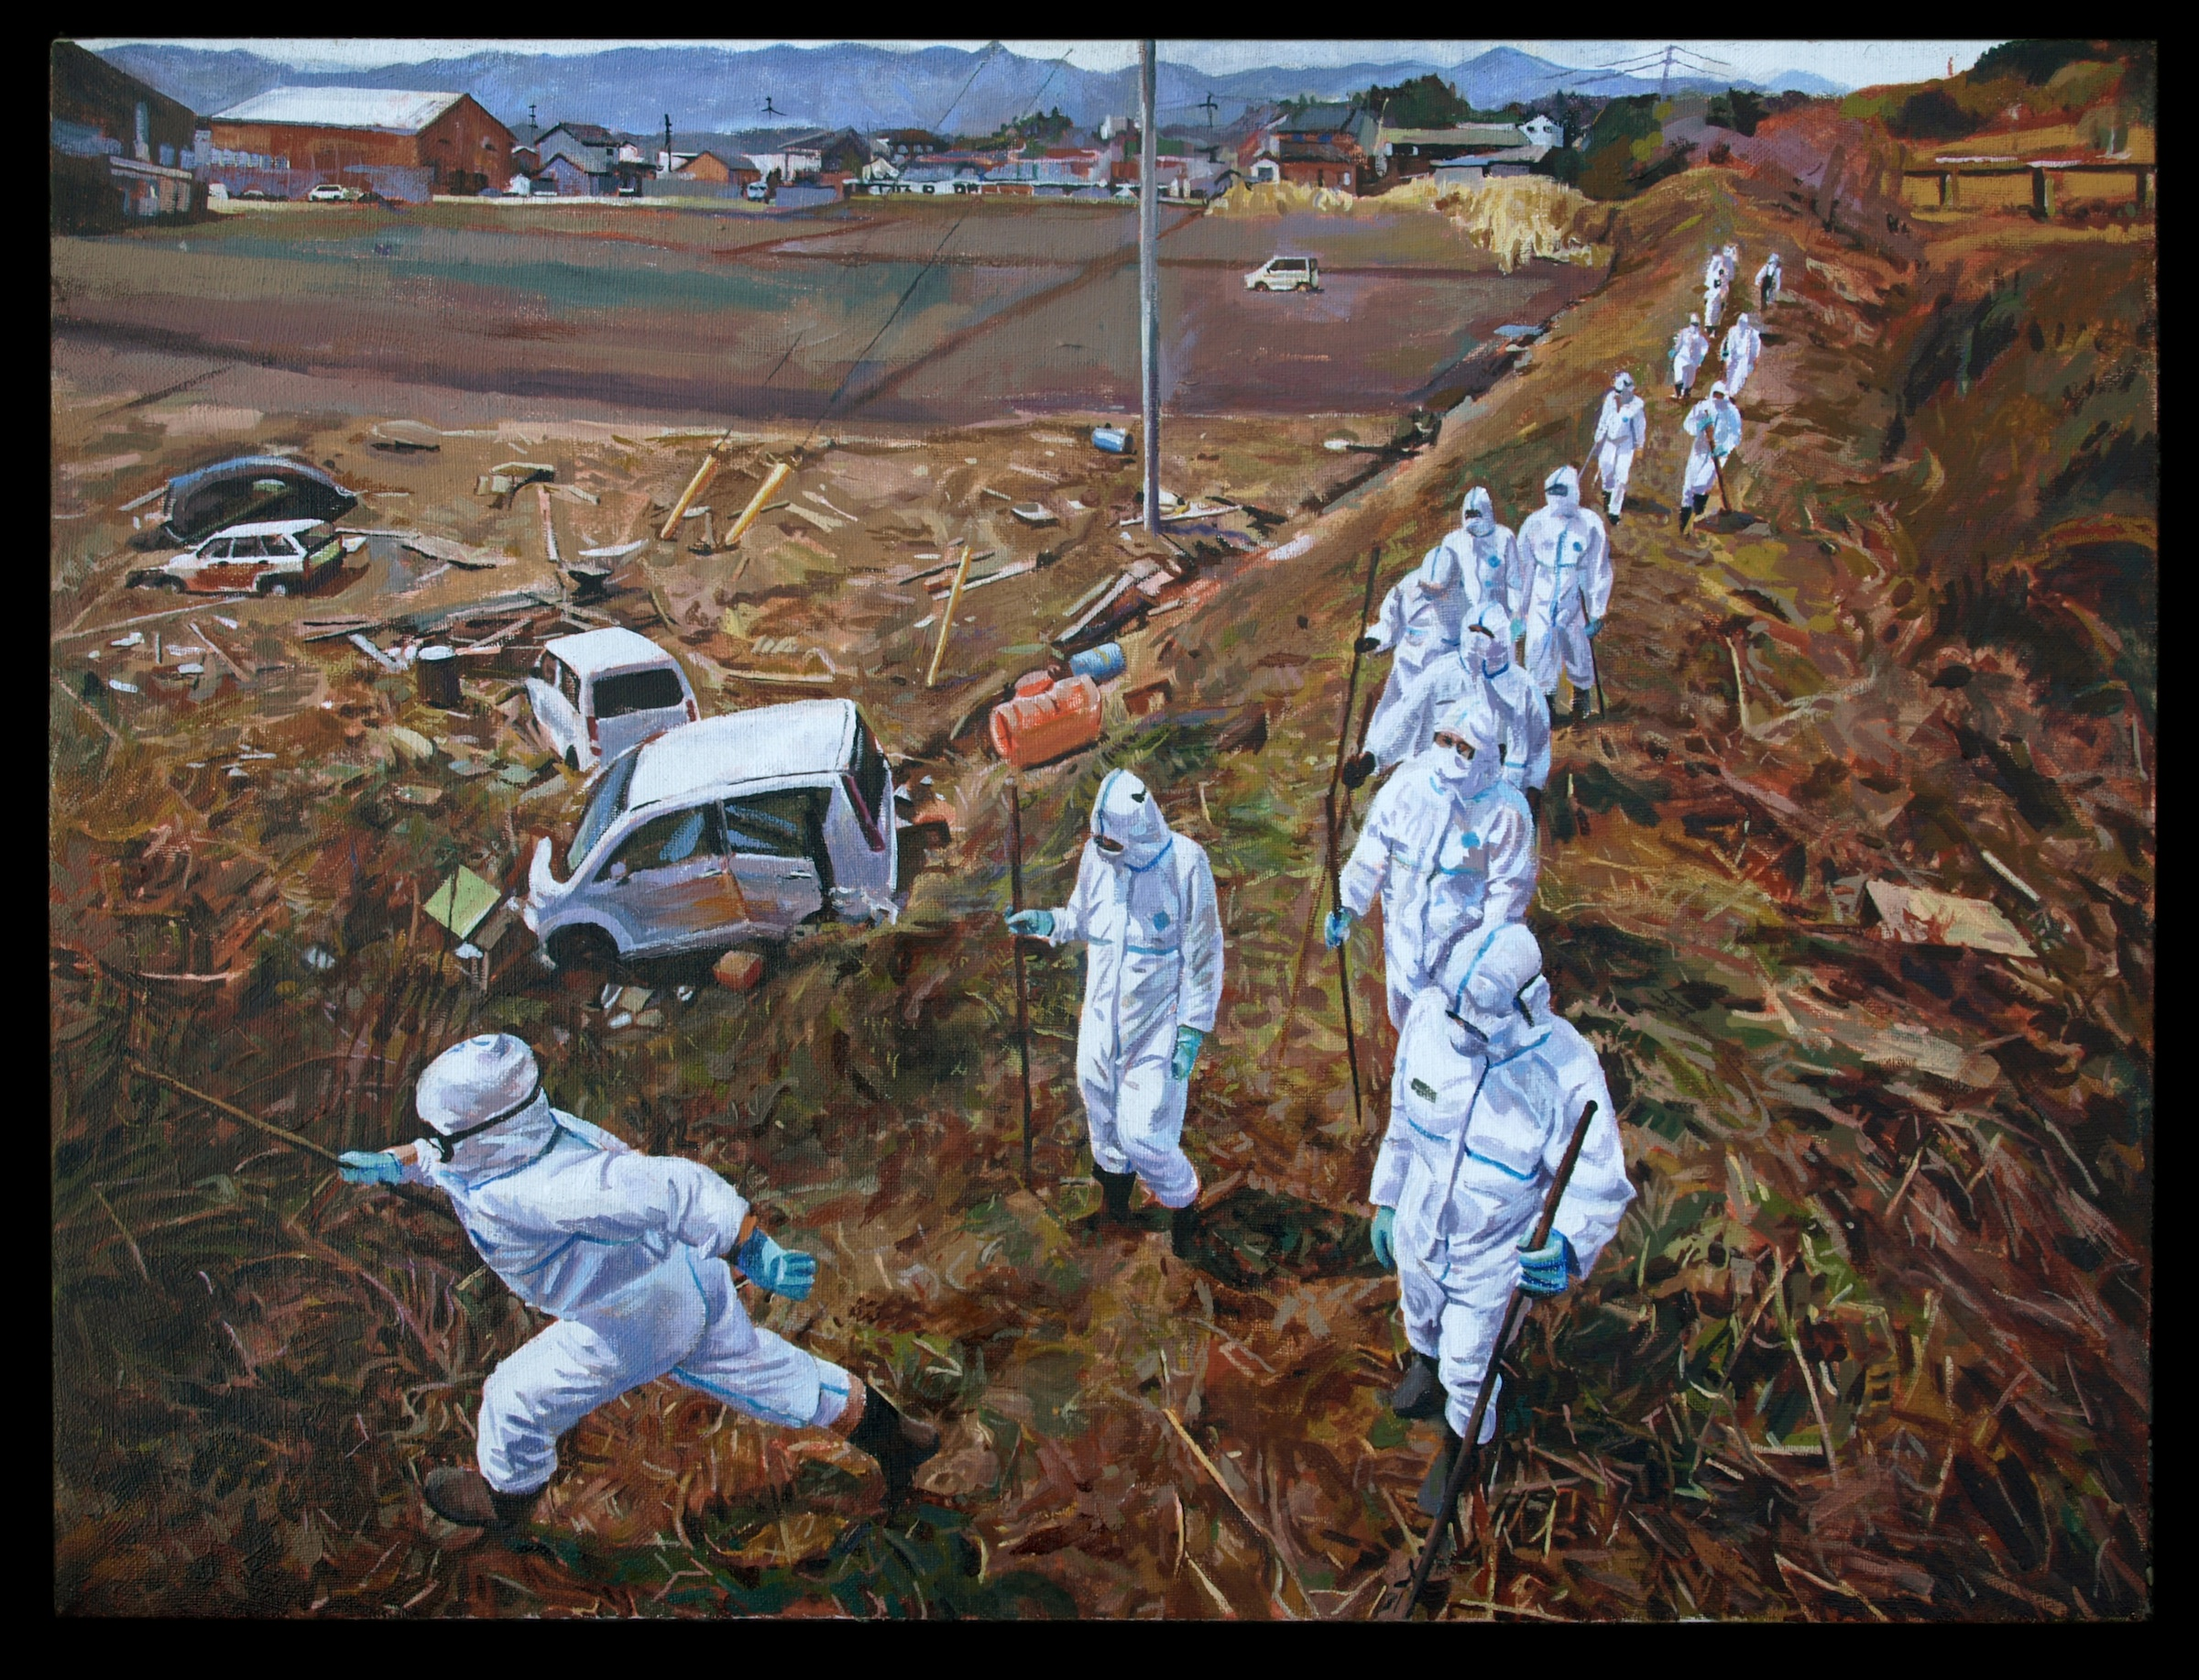 Tasha Depp, Fukushima Landscape. Oil on linen, 22x31